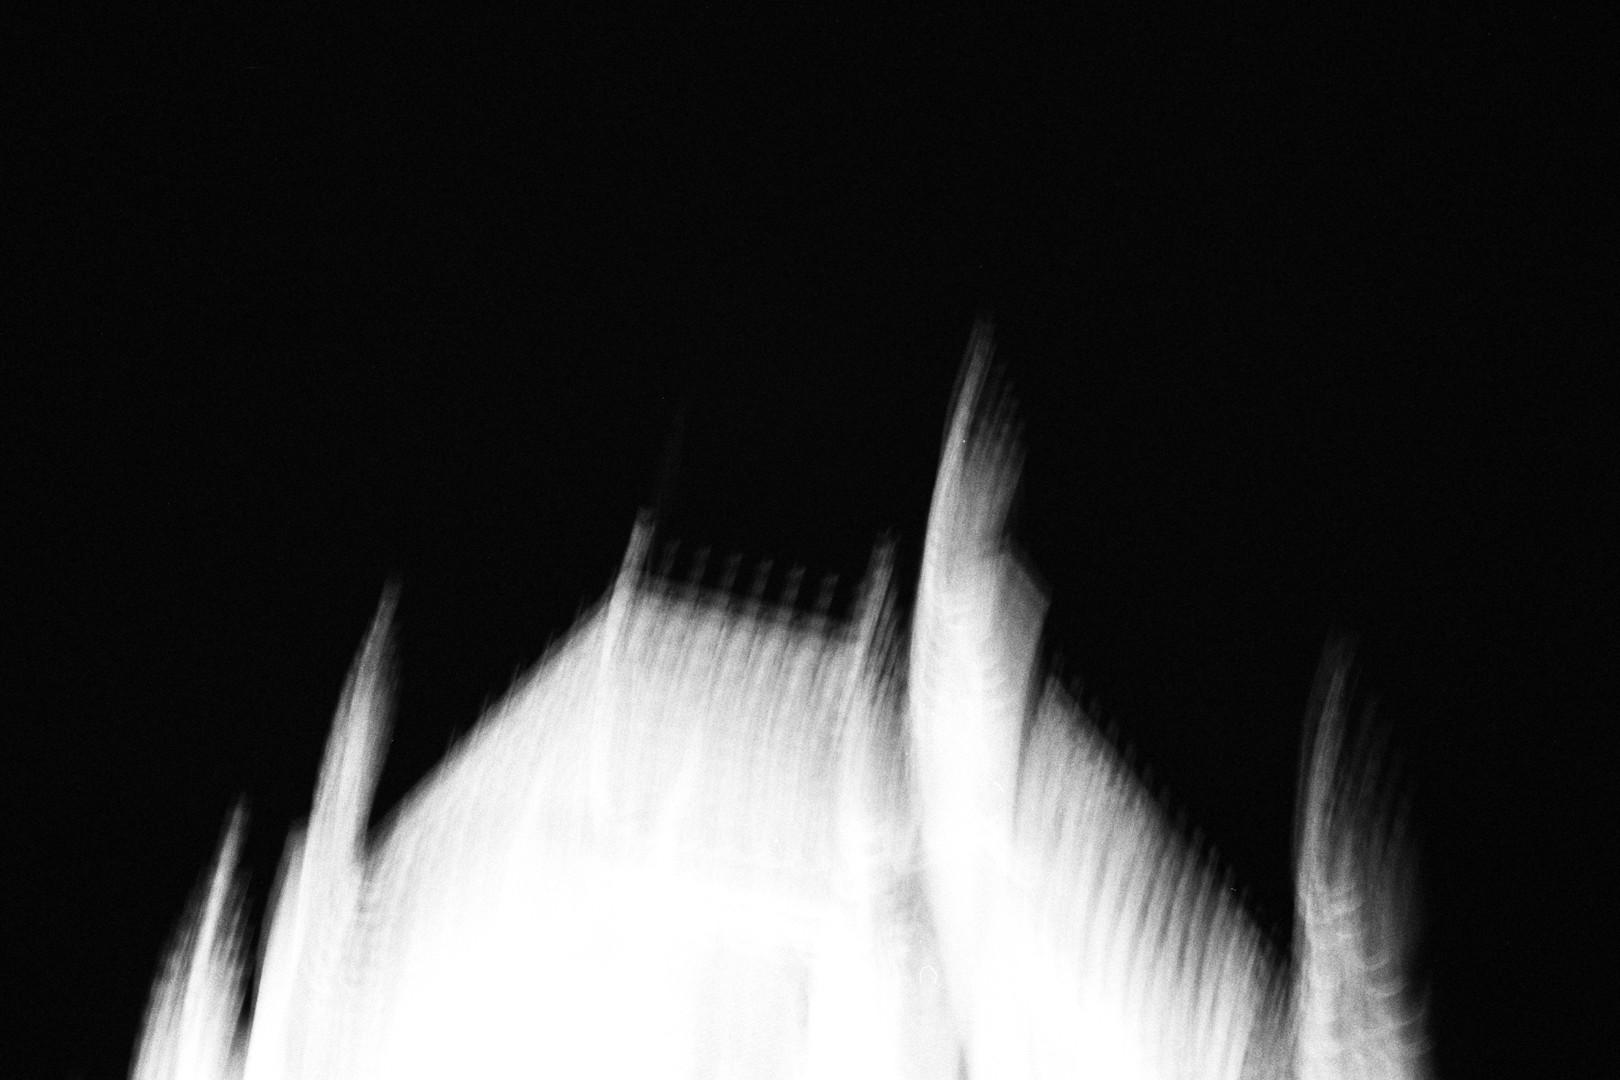 R1-04485-0056.jpg